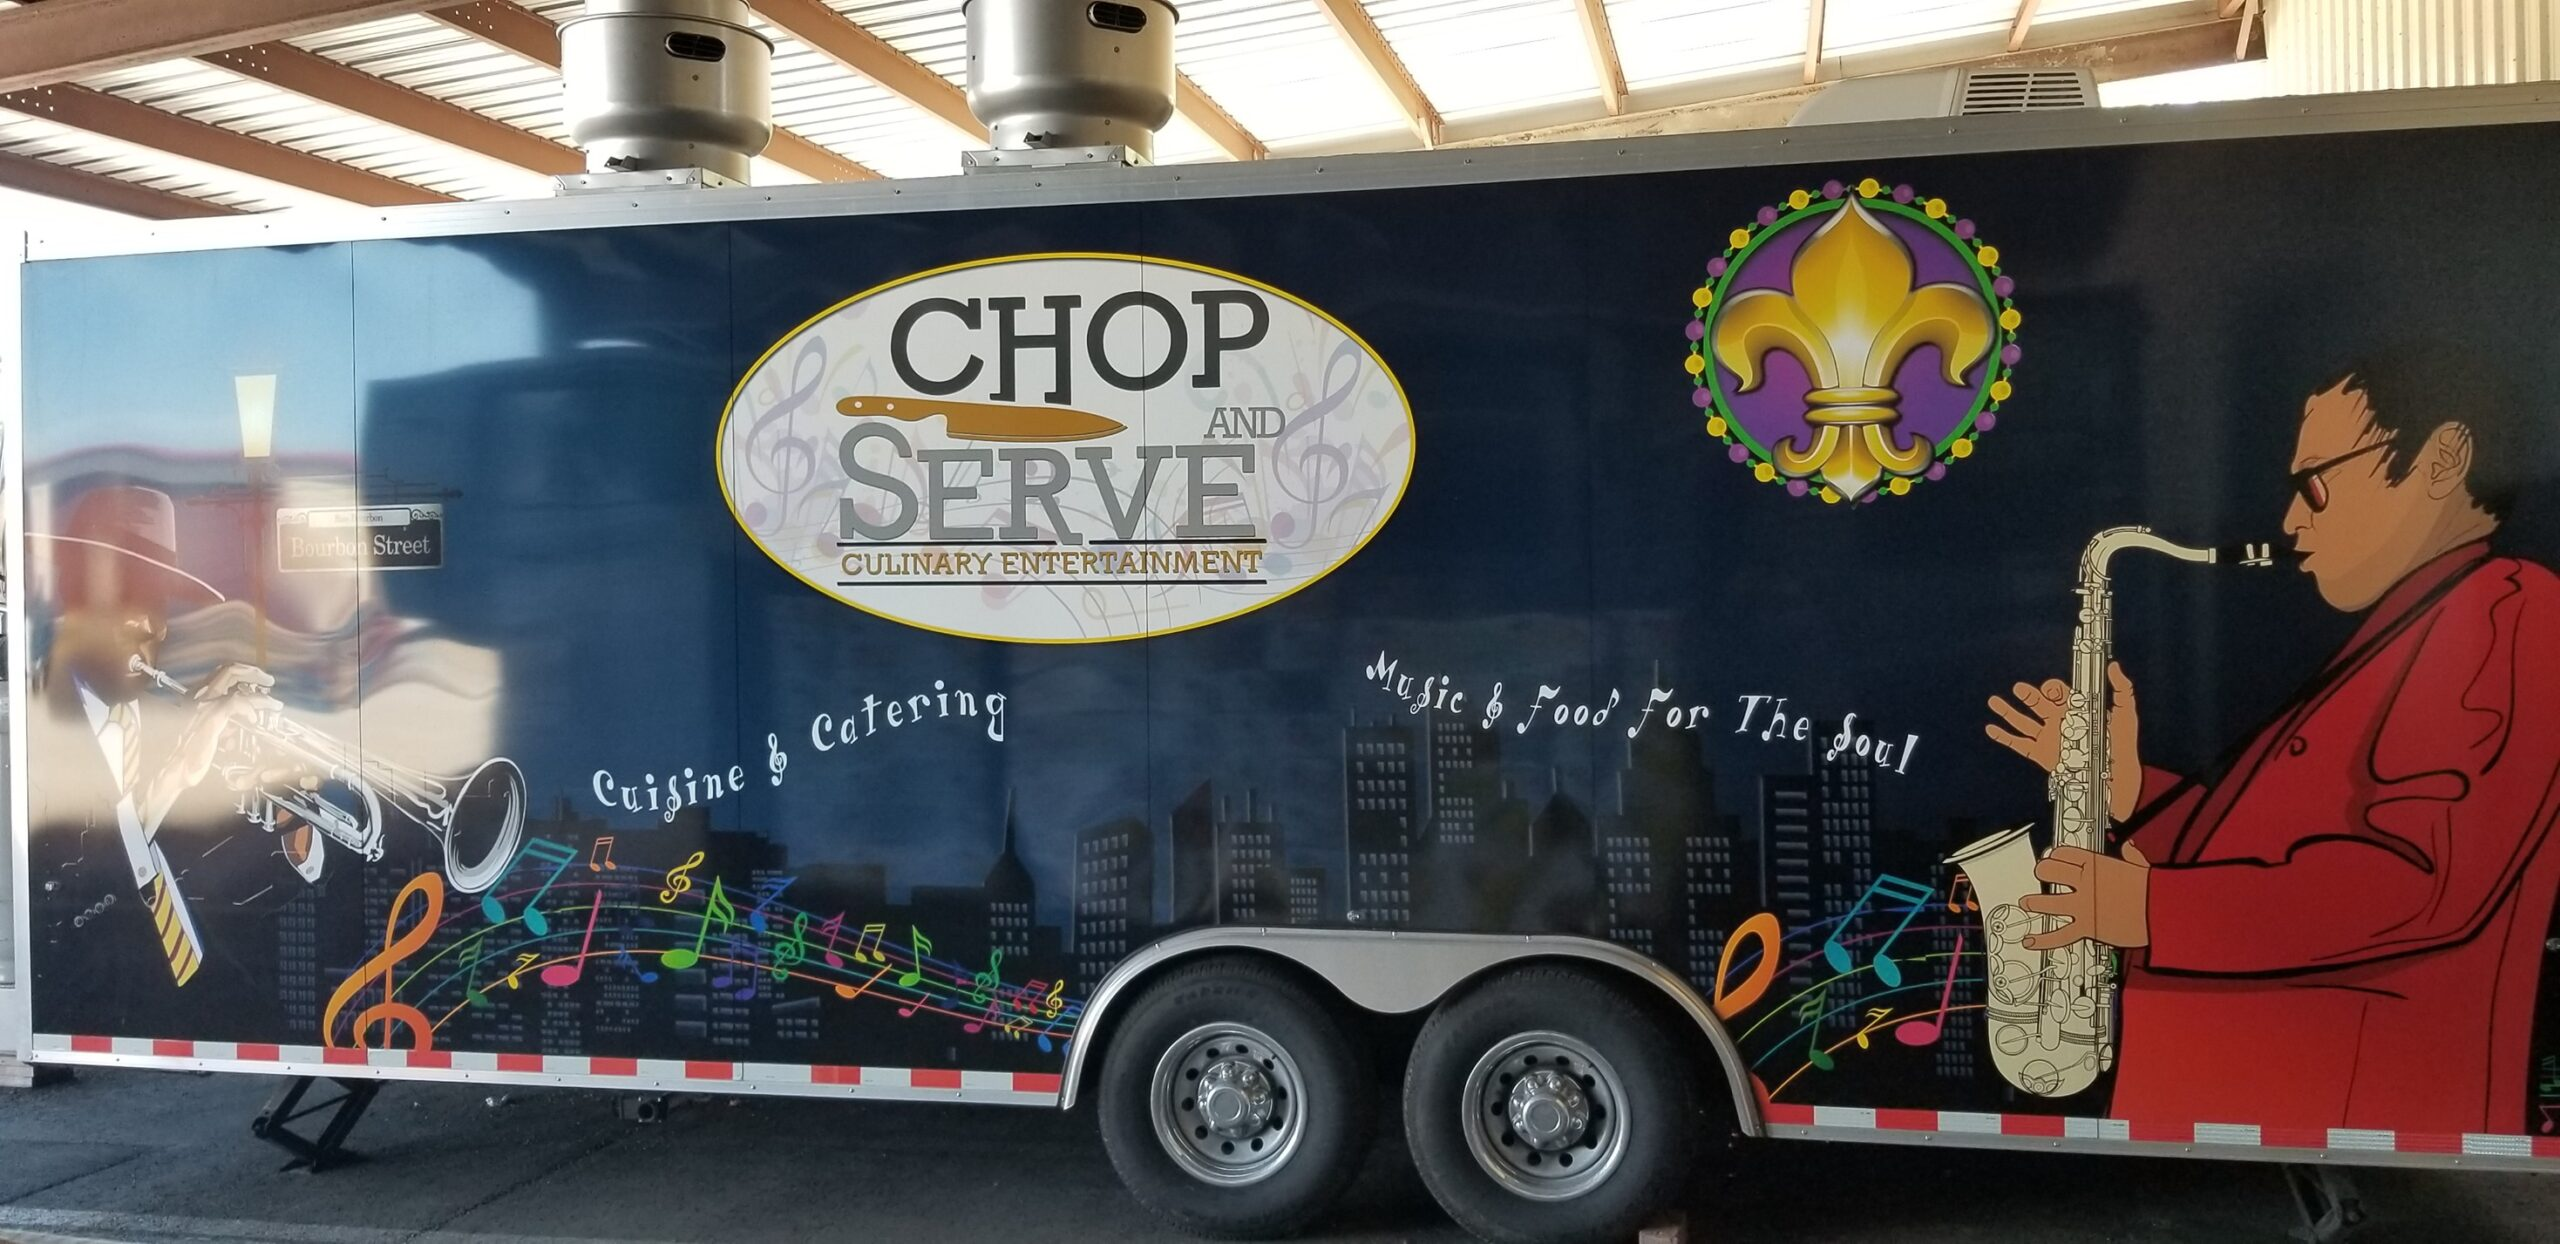 Chop And Serve